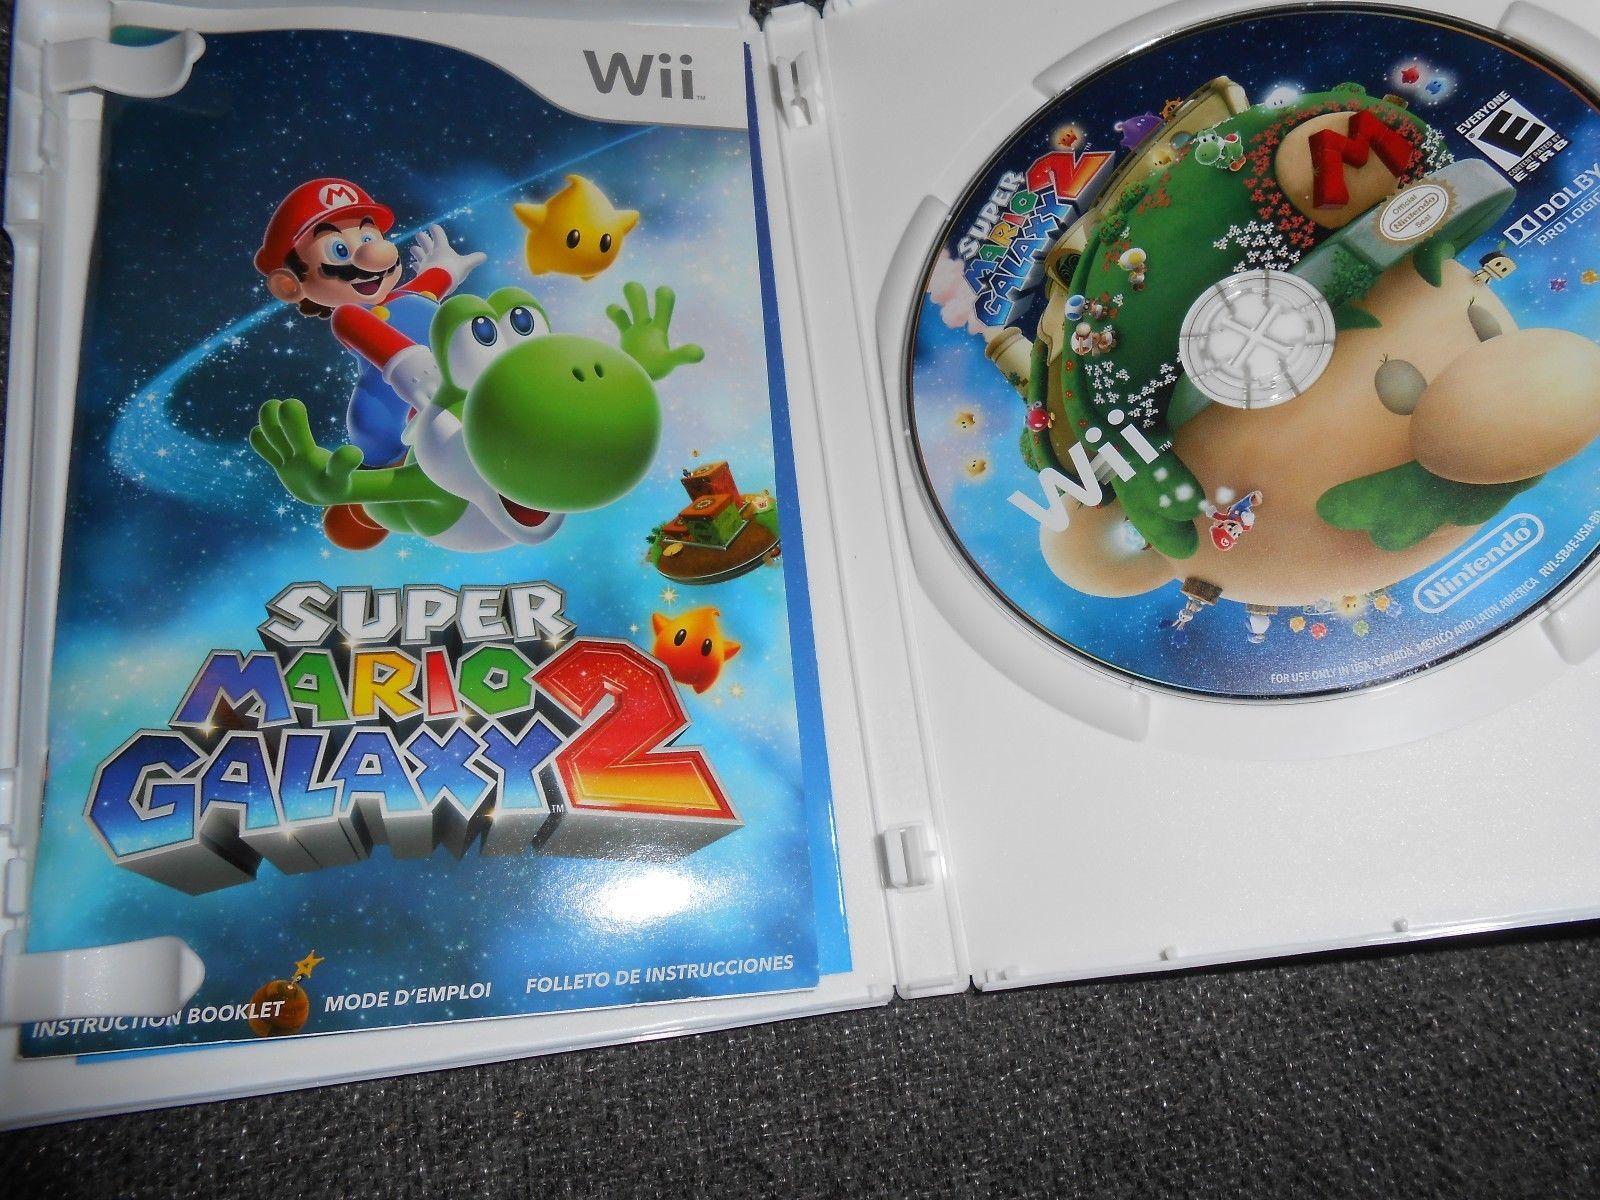 Super Mario Galaxy 2 (Nintendo Wii, 2010) and 50 similar items